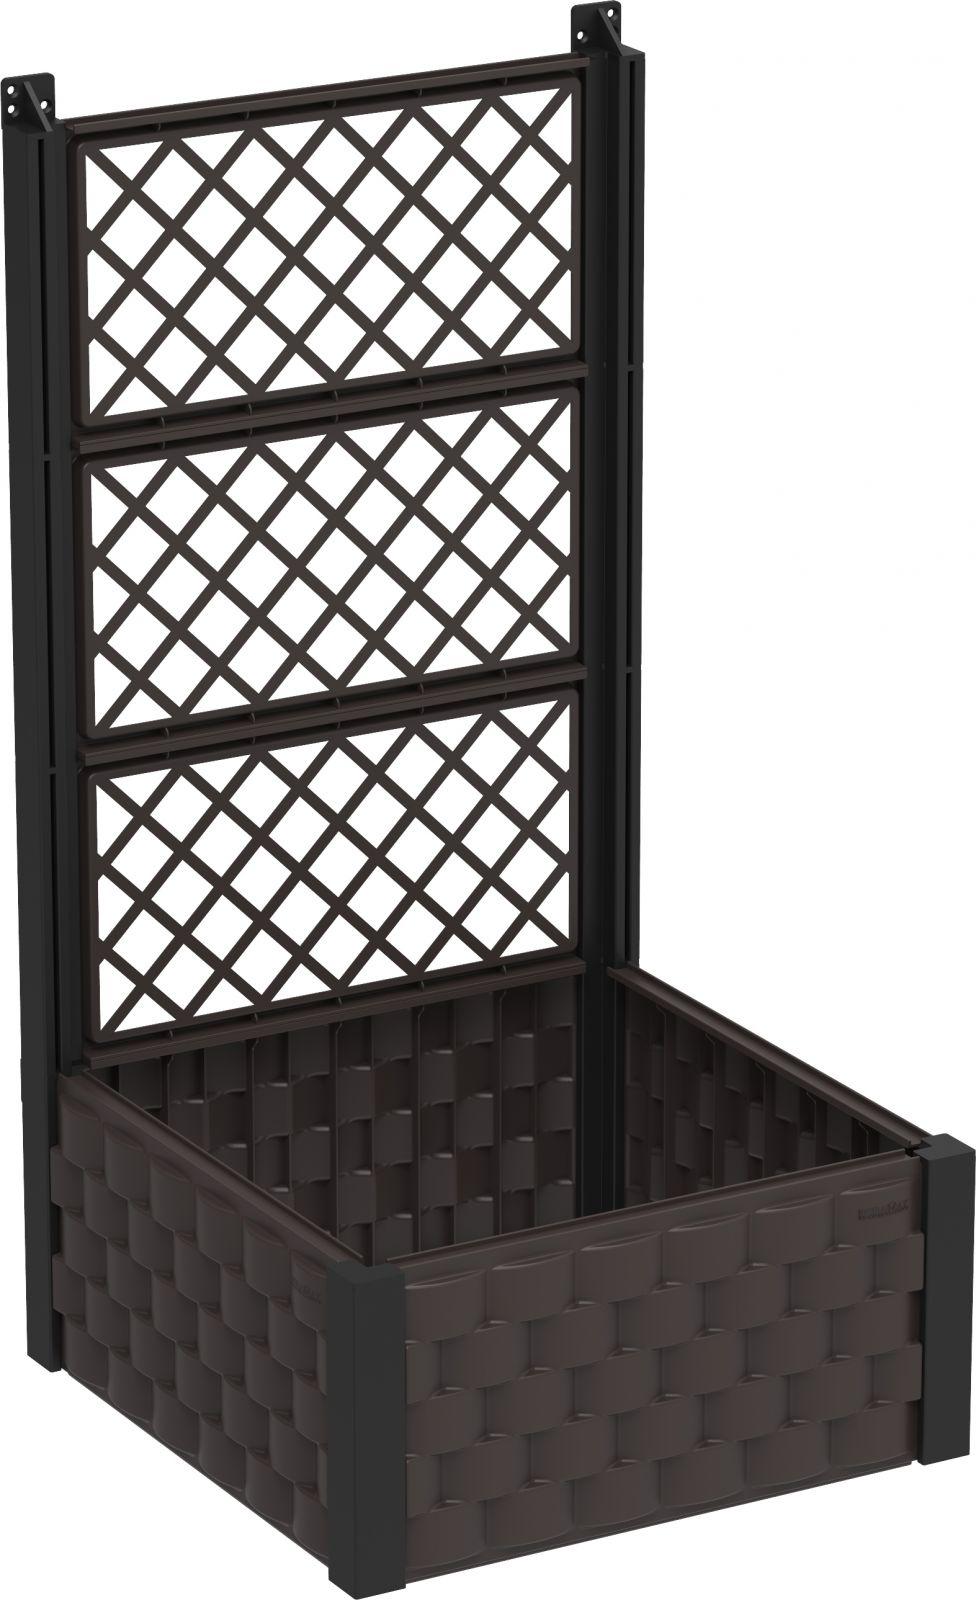 DURAMAX Nadzemní záhon 55 x 55 cm s treláží, hnědý, Duramax IDMFPGB006DW